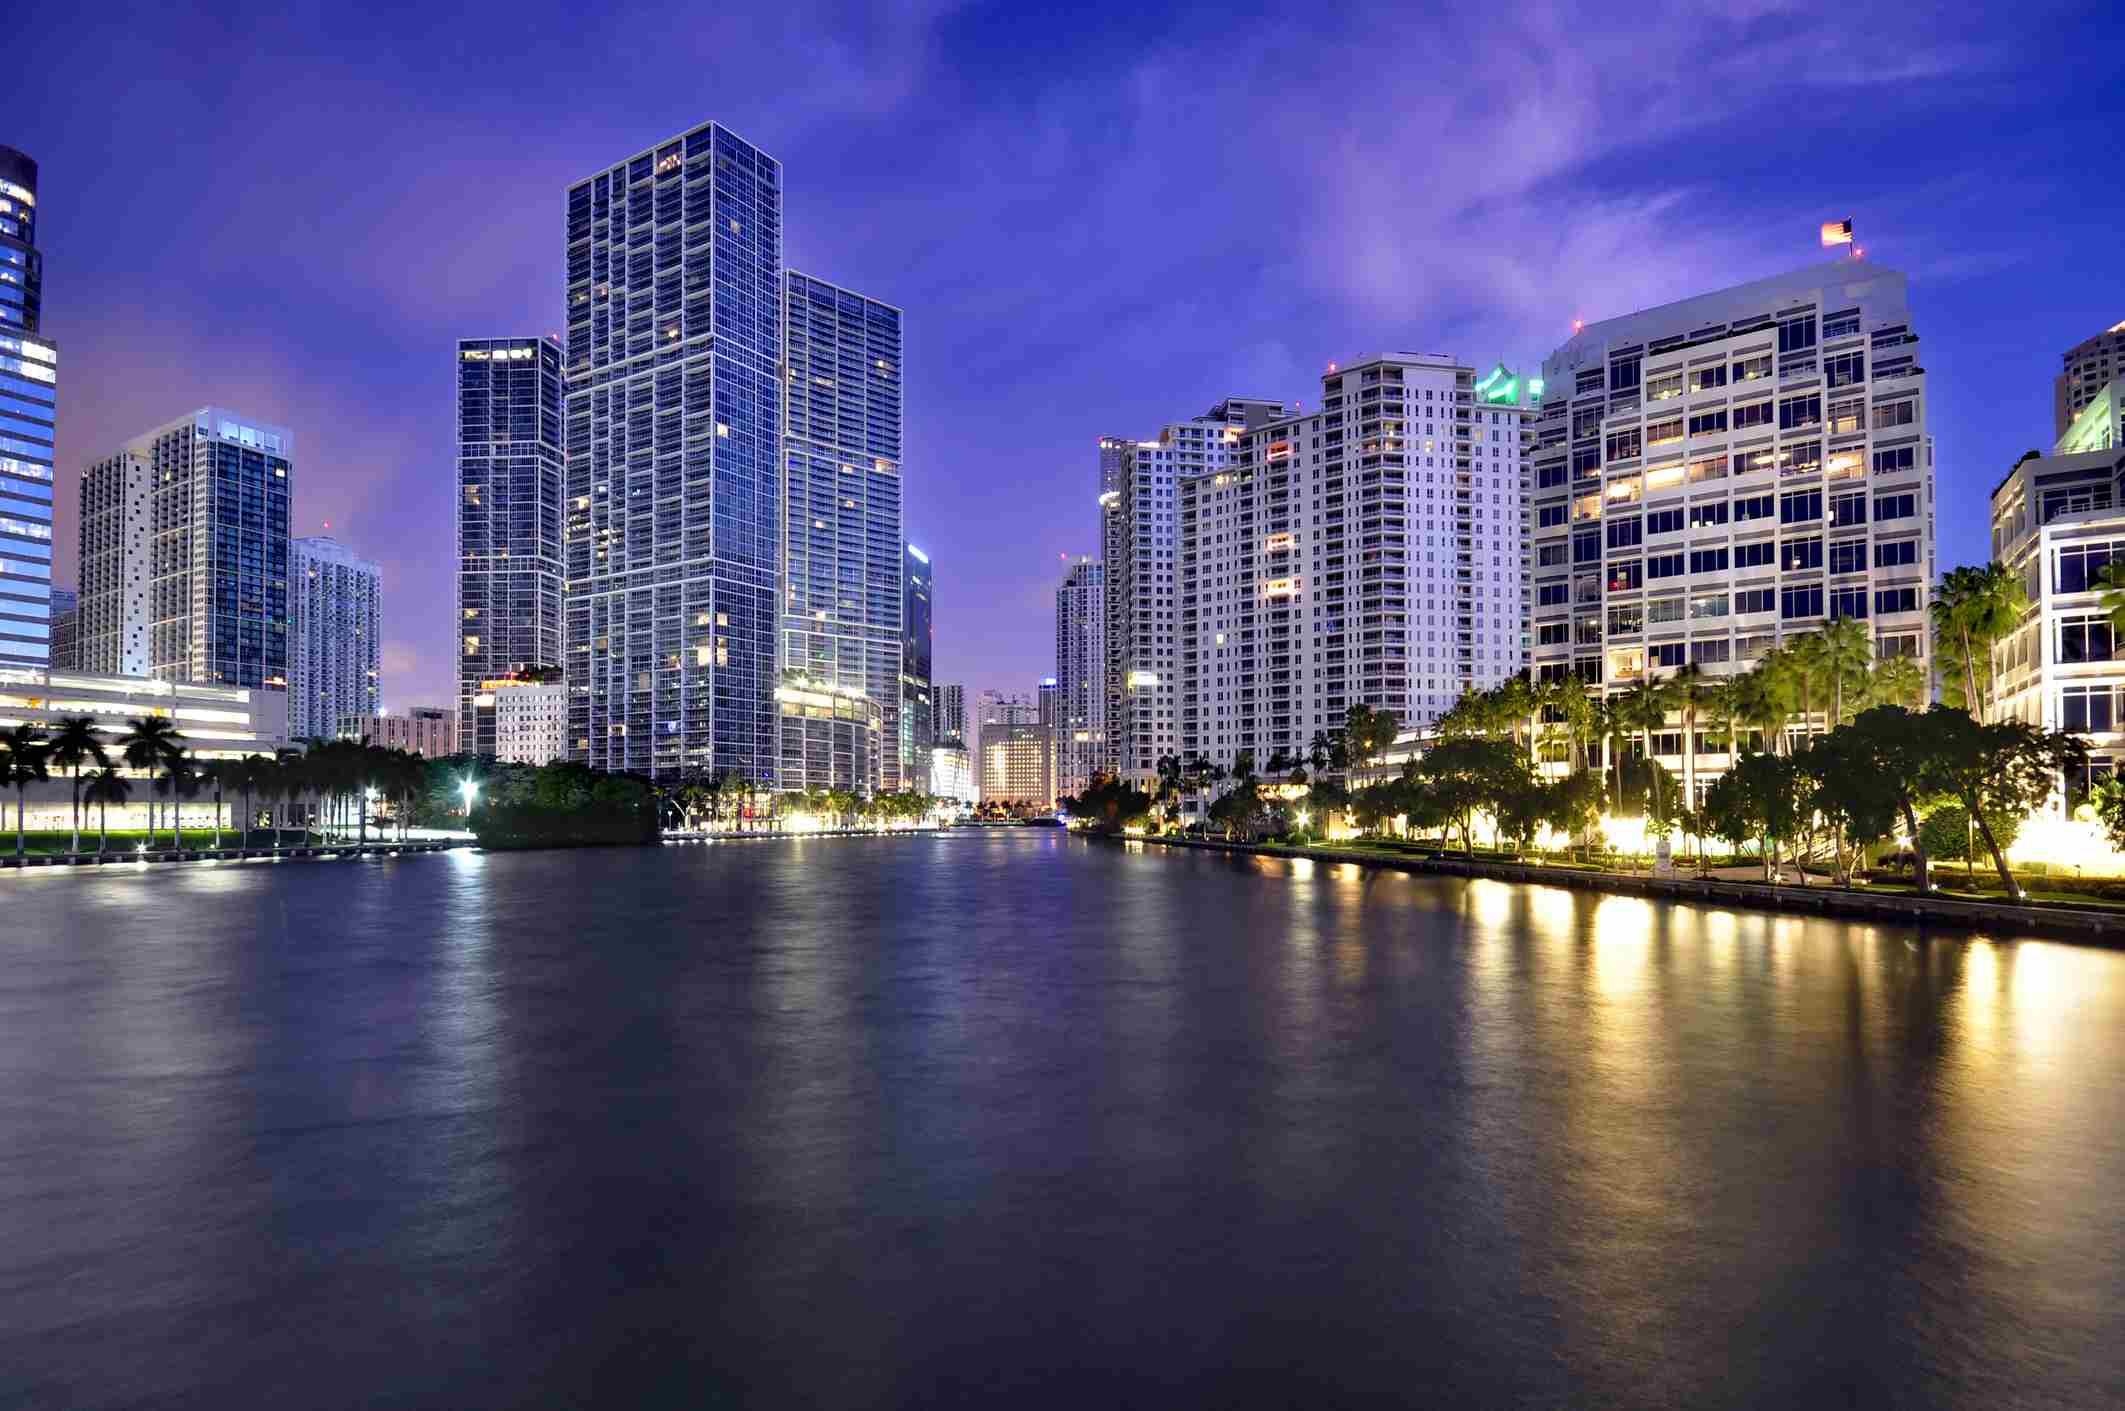 Brickell downtown at dusk, Miami